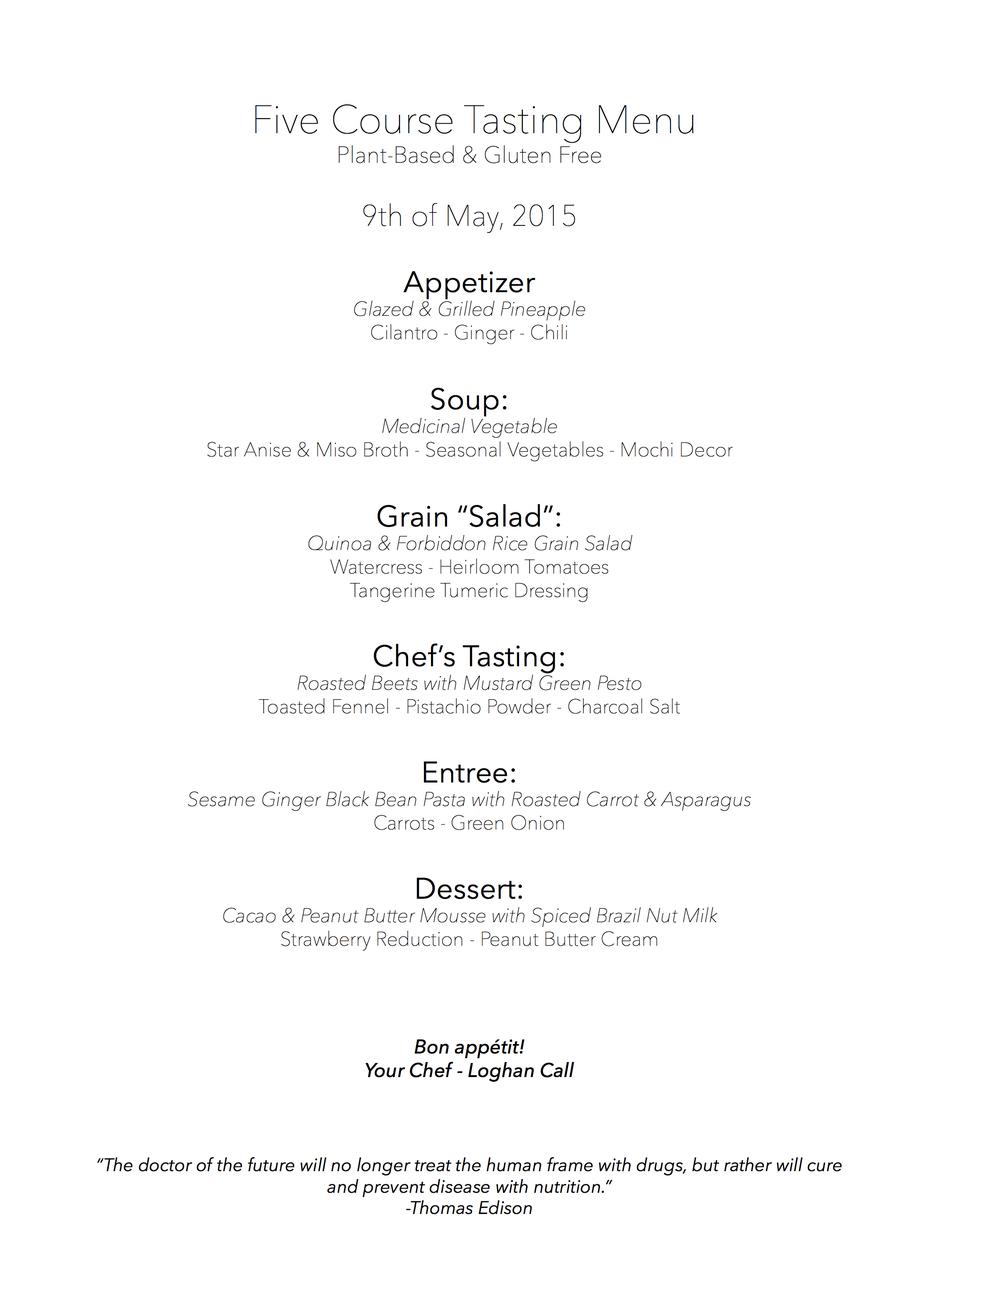 Chef's Tasting Menu - 5.9.15.jpg